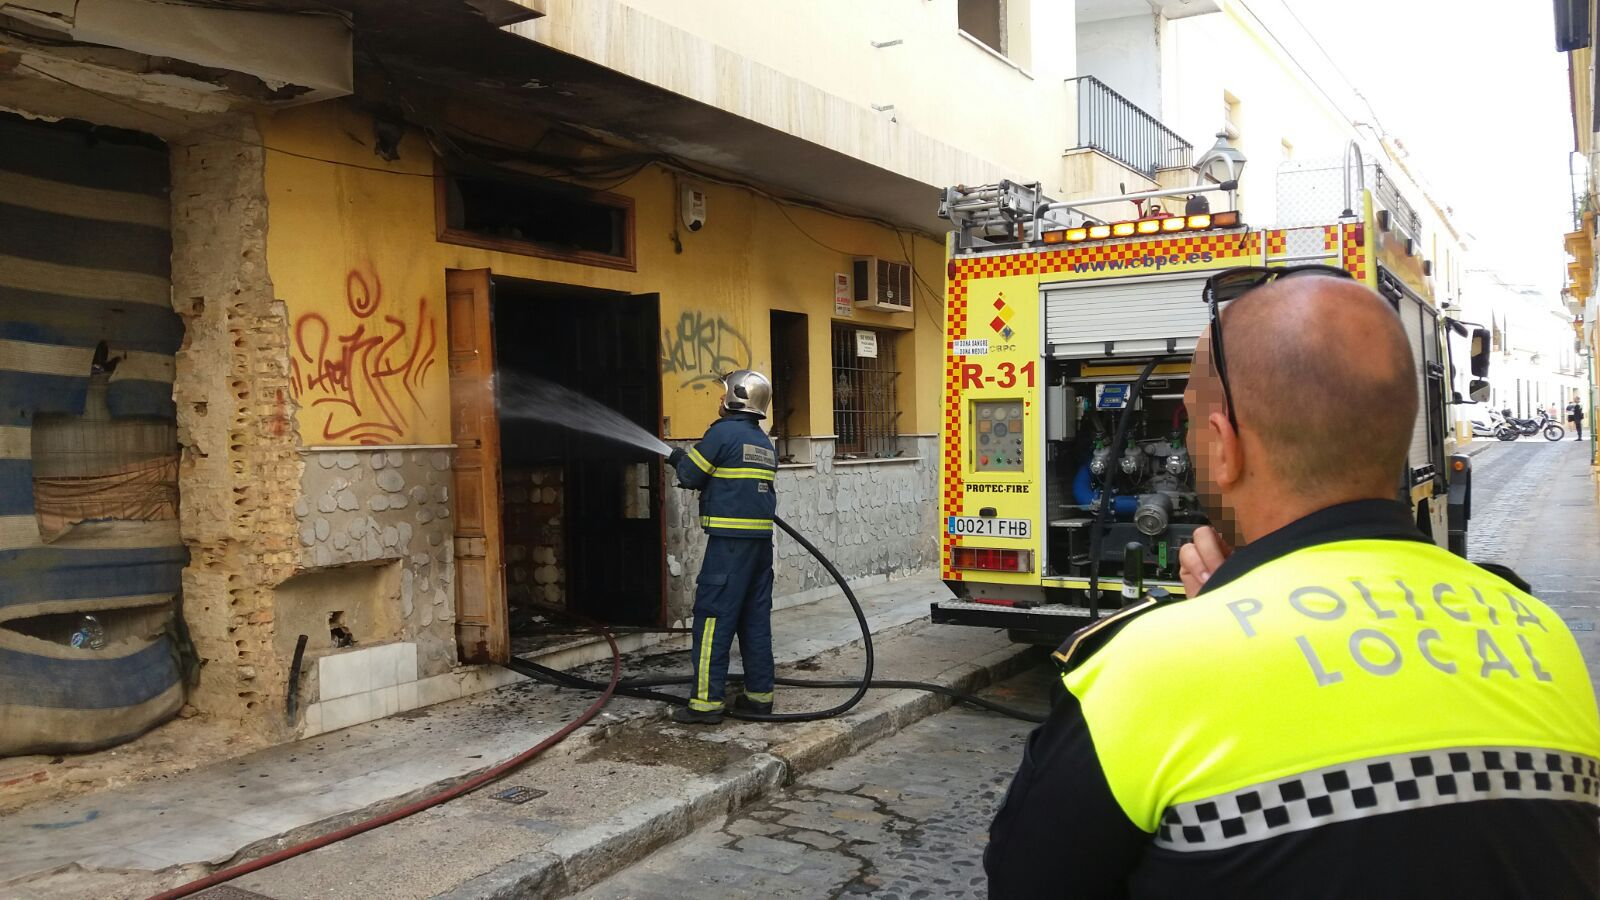 Incendio en calle Gaspar Fernández, Jerez. MAYO 2016 | MIRA Comunicación